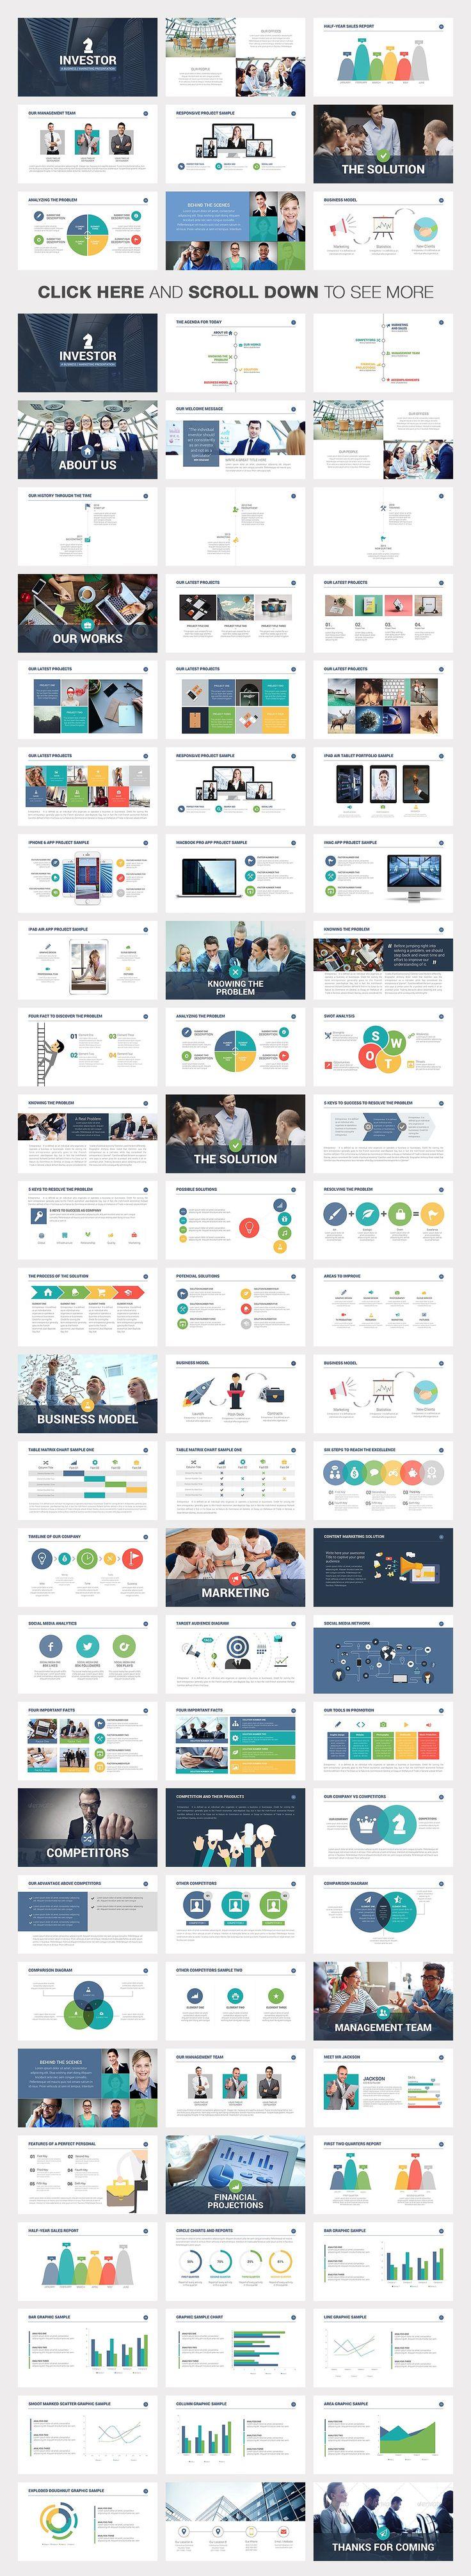 MEGA EMPIRE Powerpoint + Keynote by Slidedizer on @creativemarket